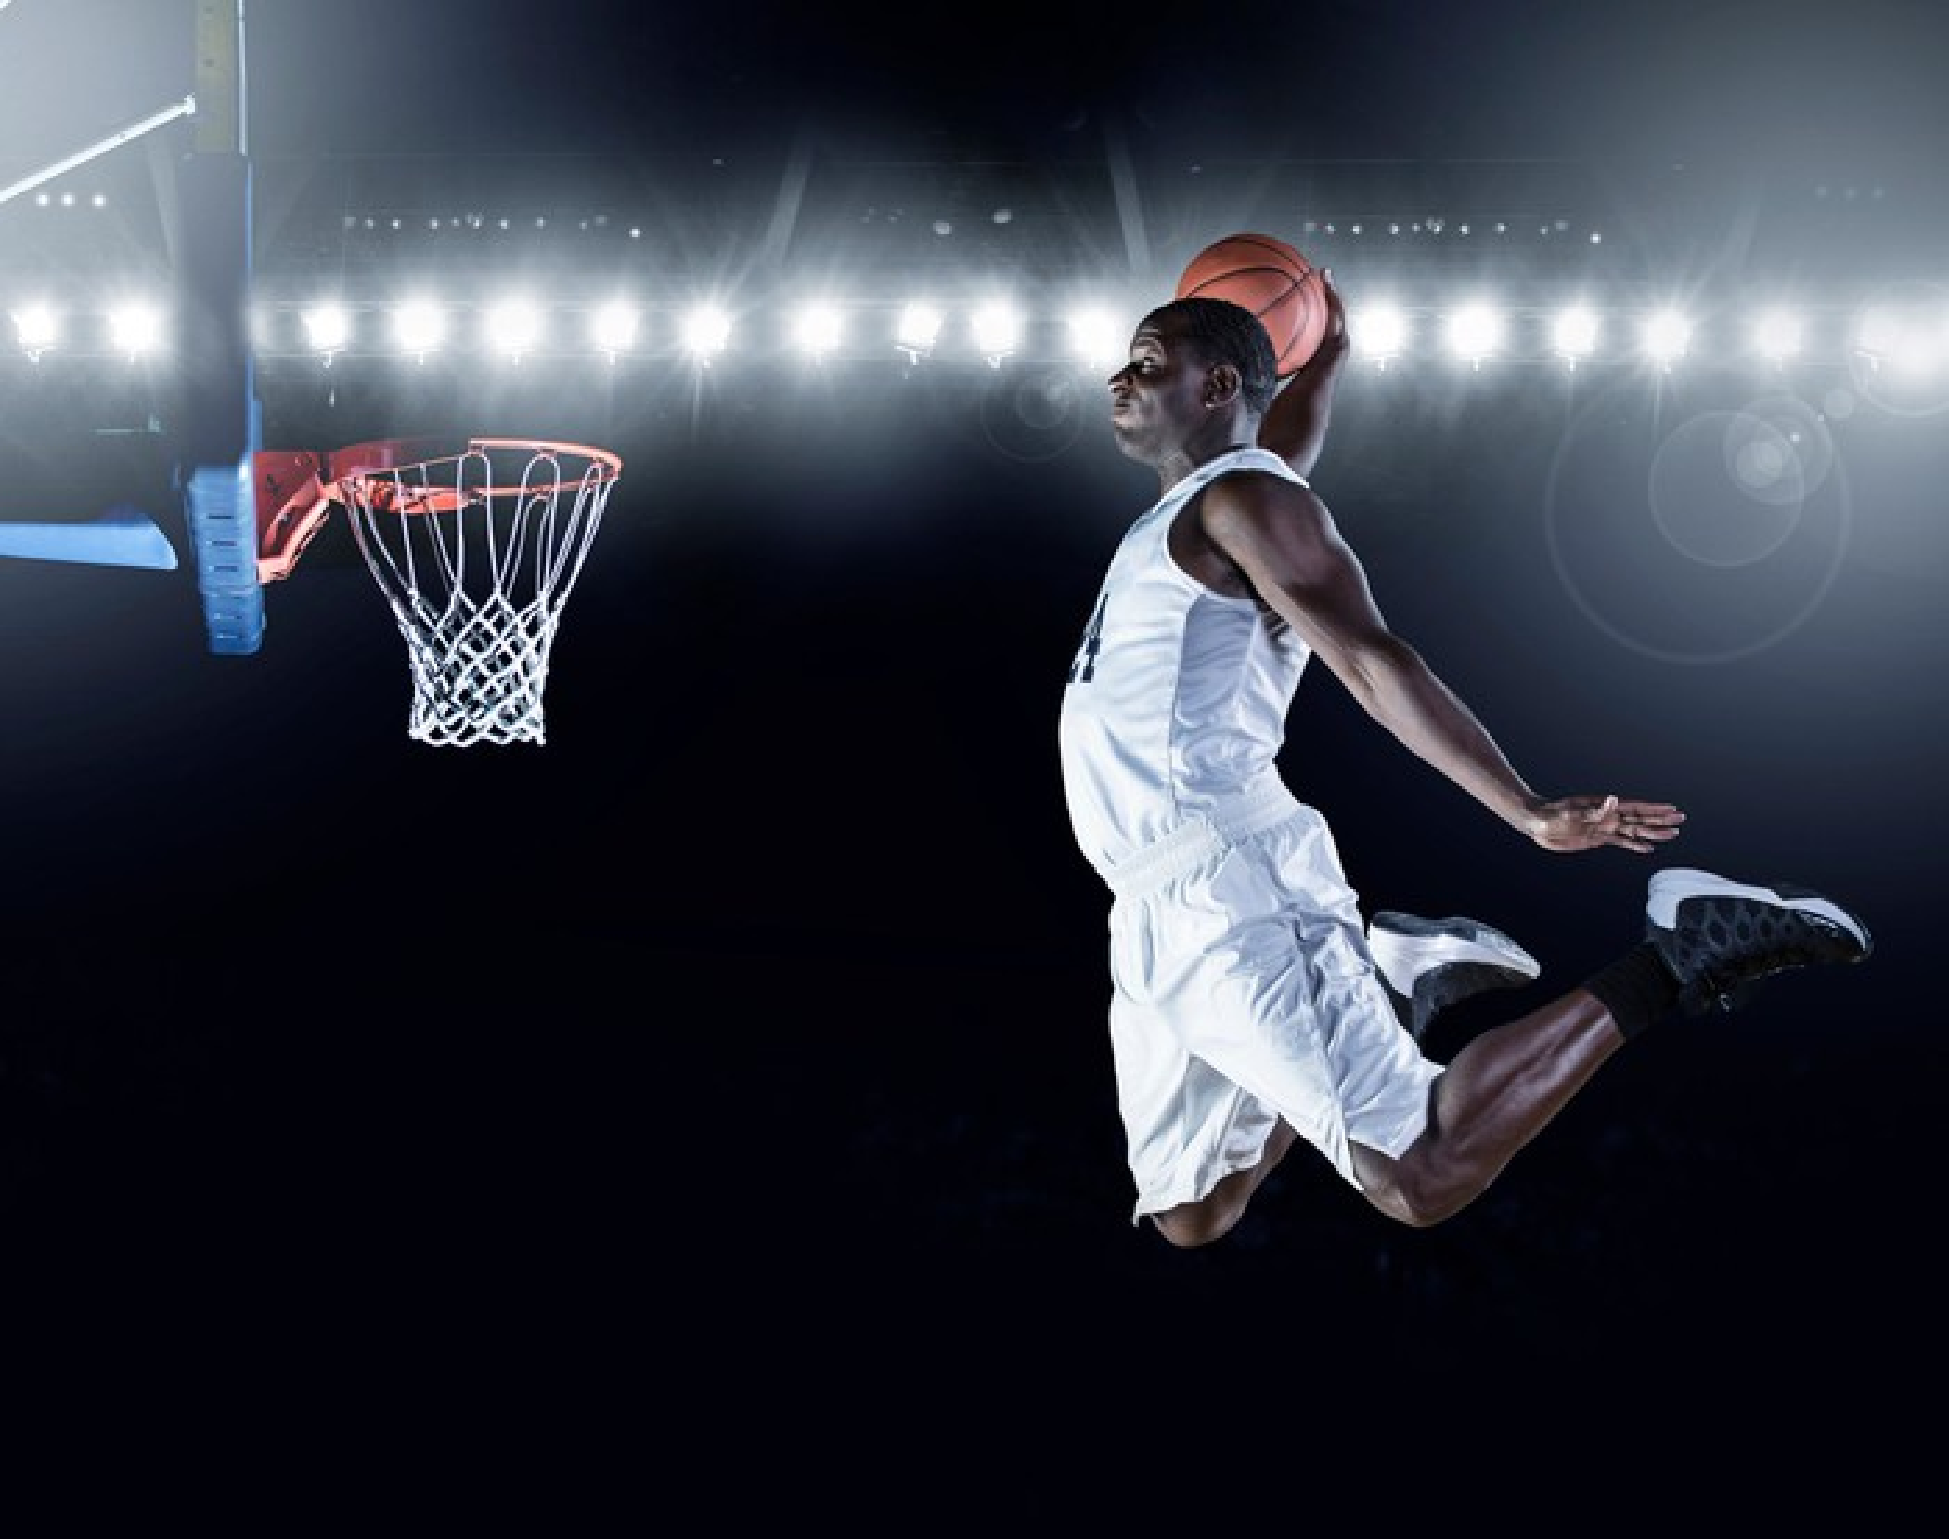 Basketball player dunking basketball.